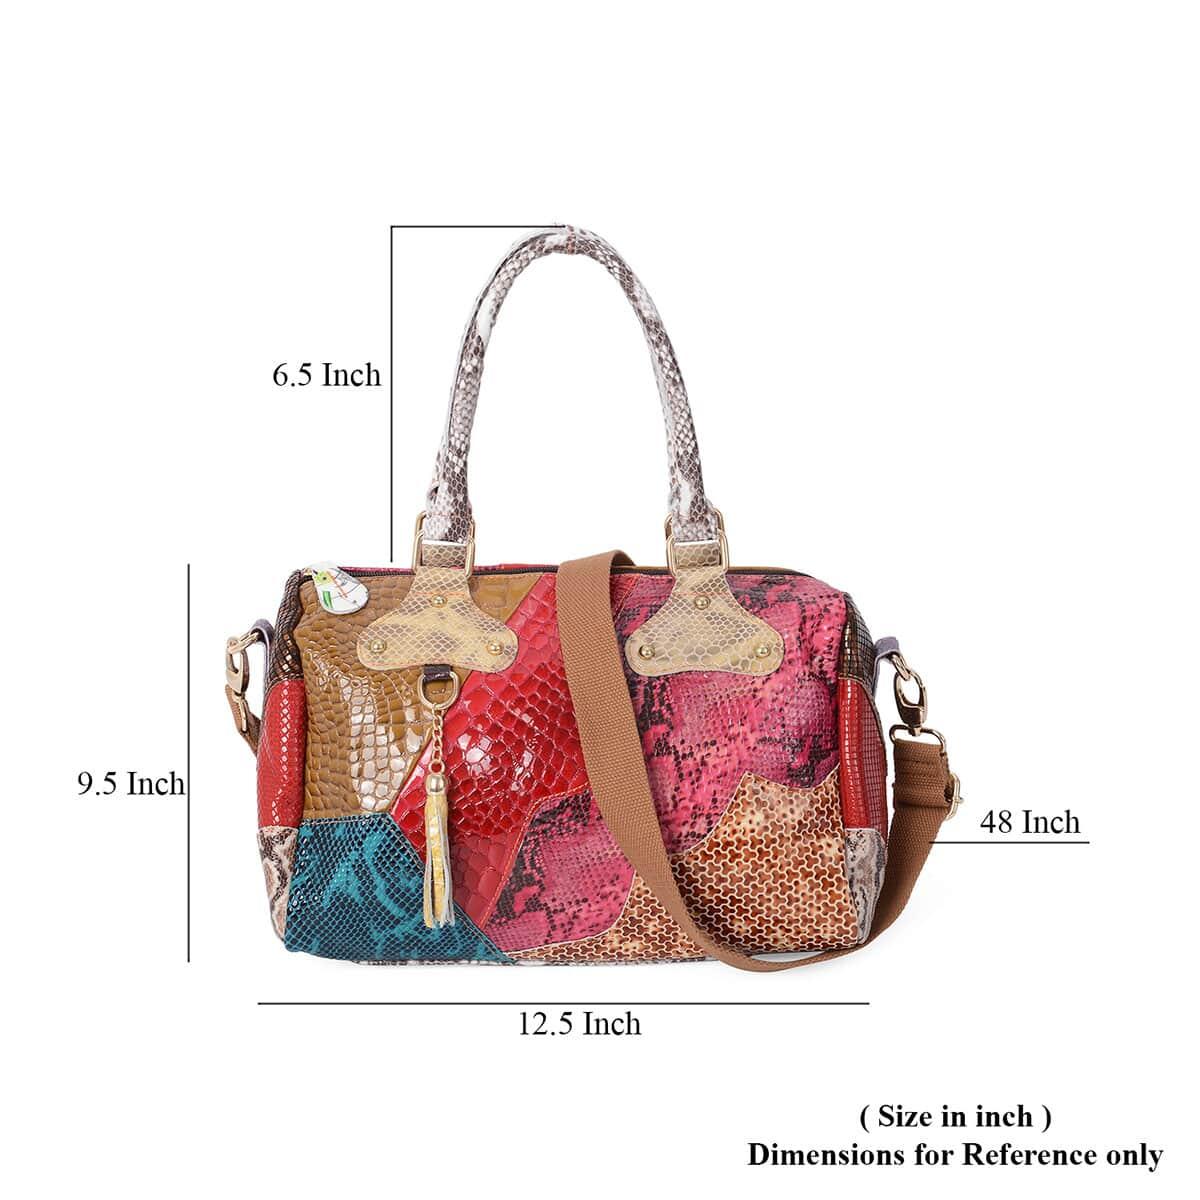 Multi Color Block Pattern Genuine Leather Tote Bag with Shoulder Strap